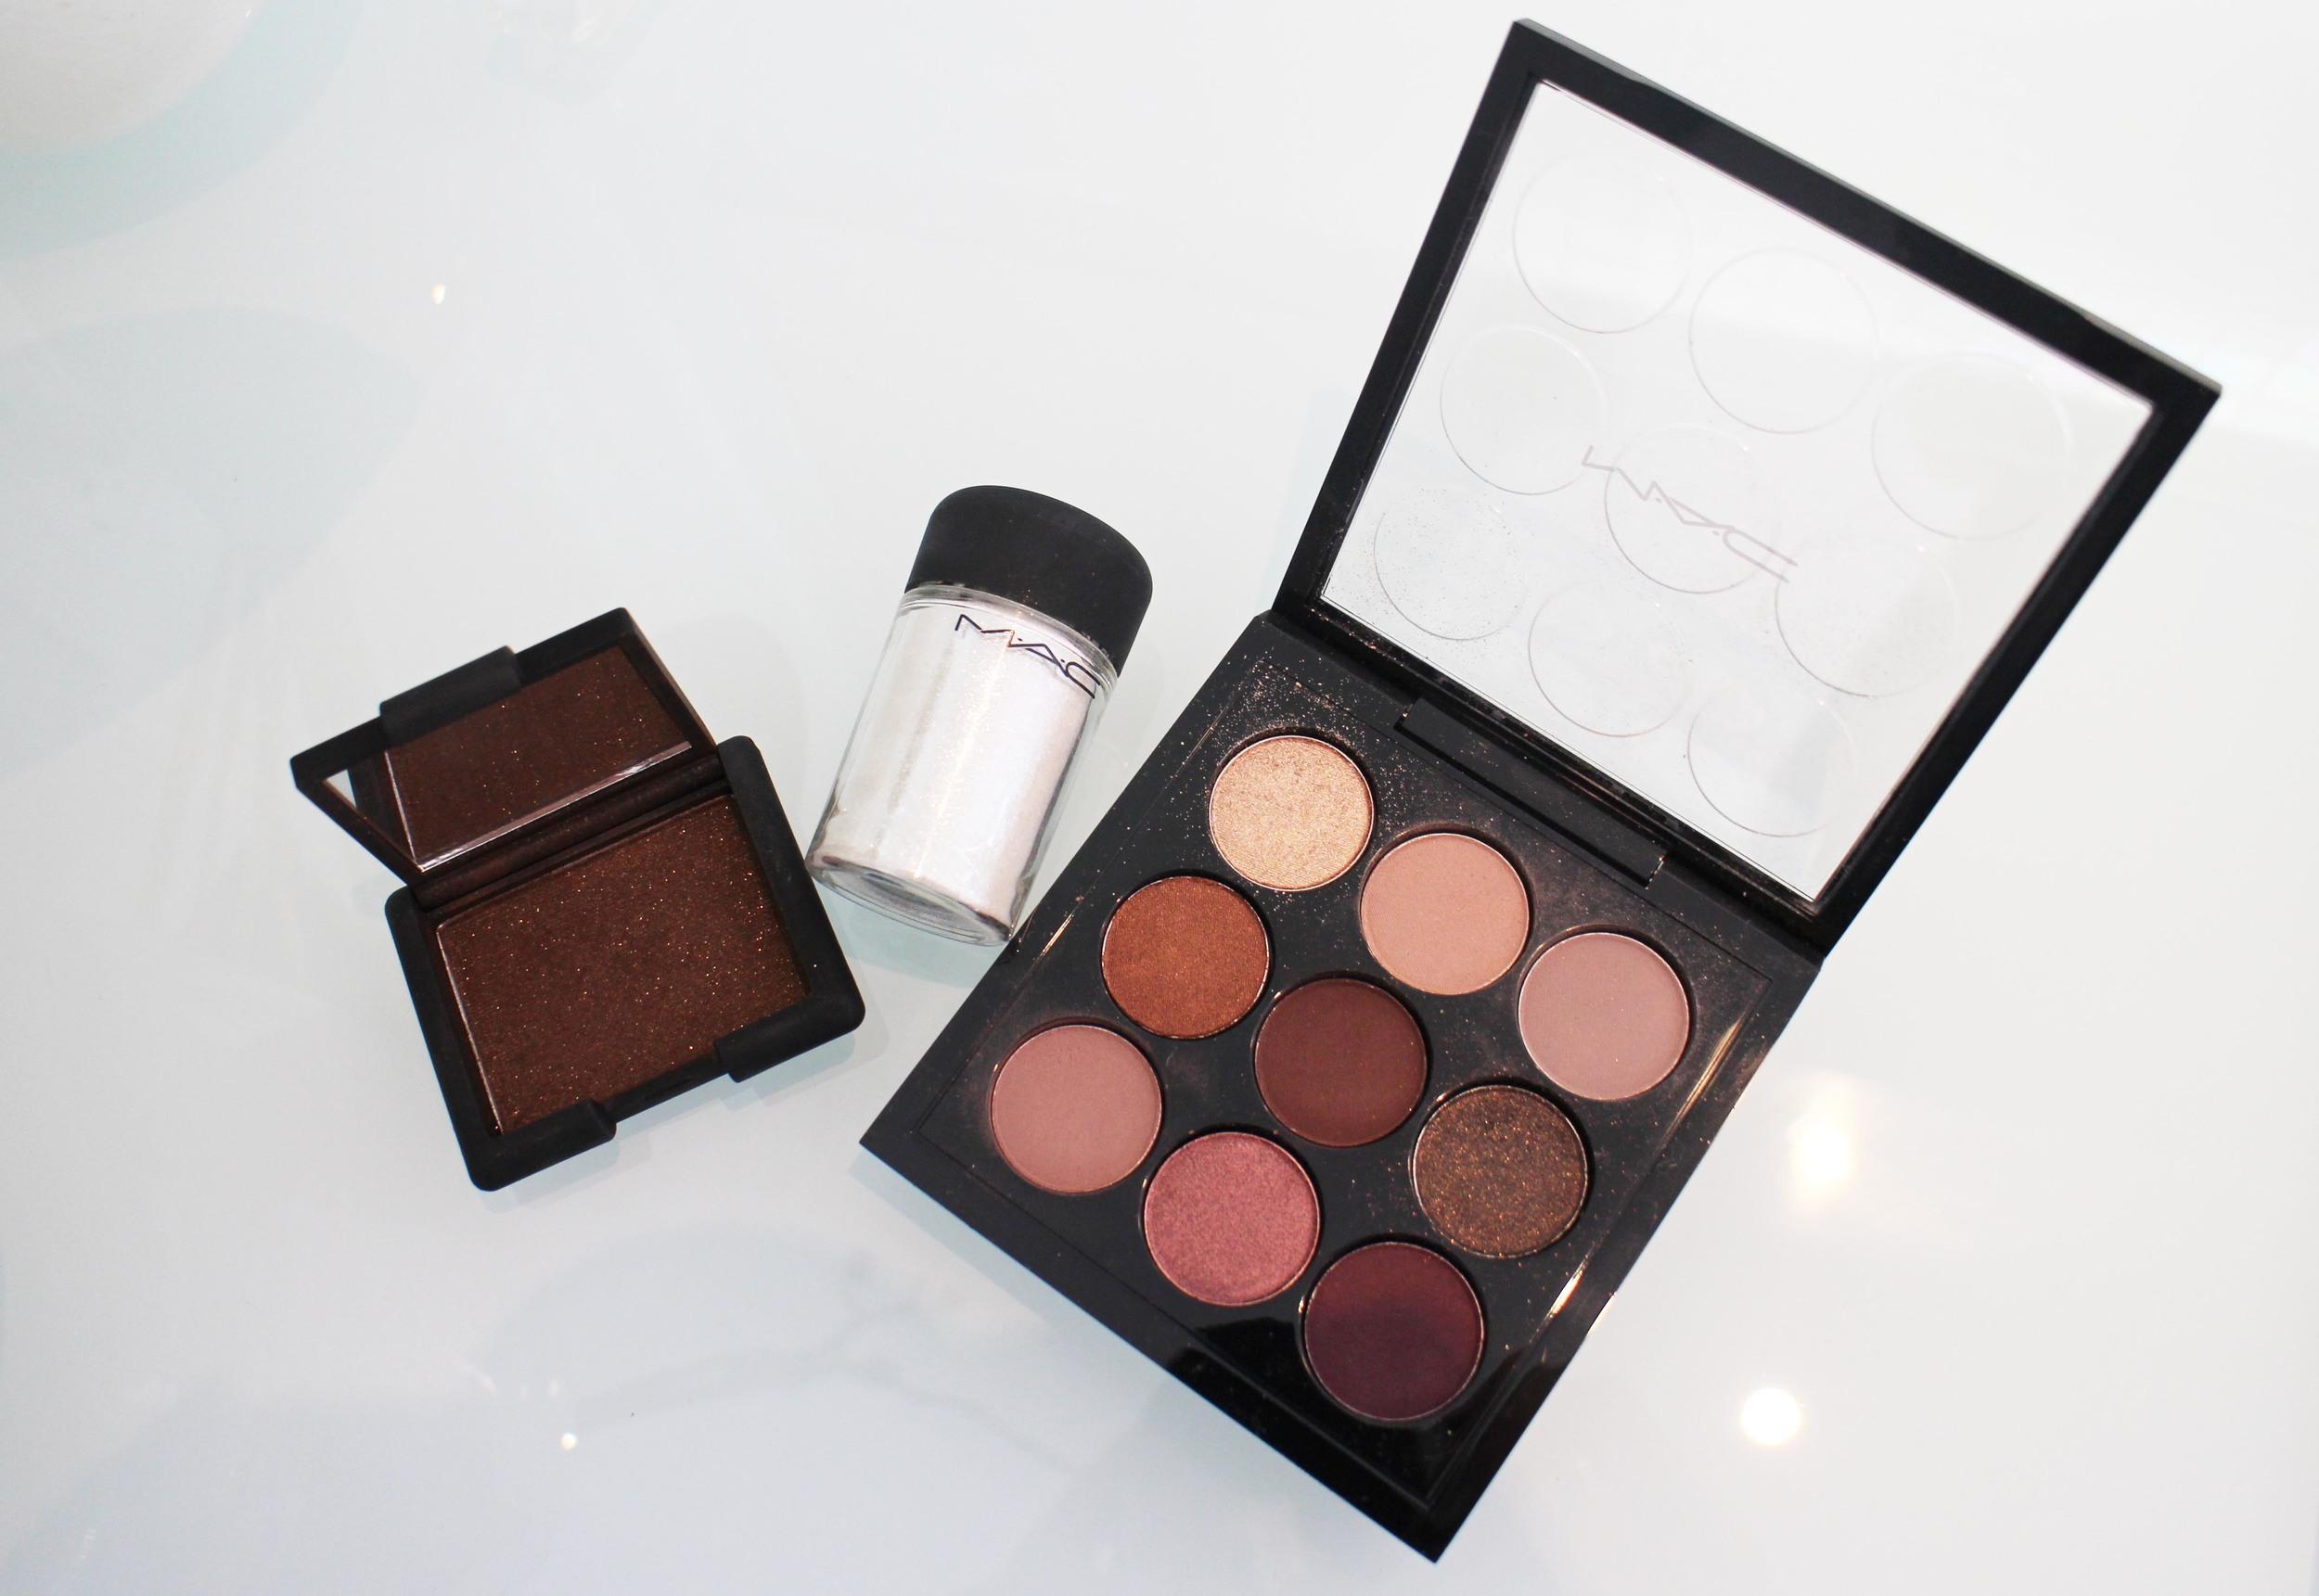 Nars (Galapagos)  -  Mac Reflects Pigment (Pearl)  -  Mac Palette